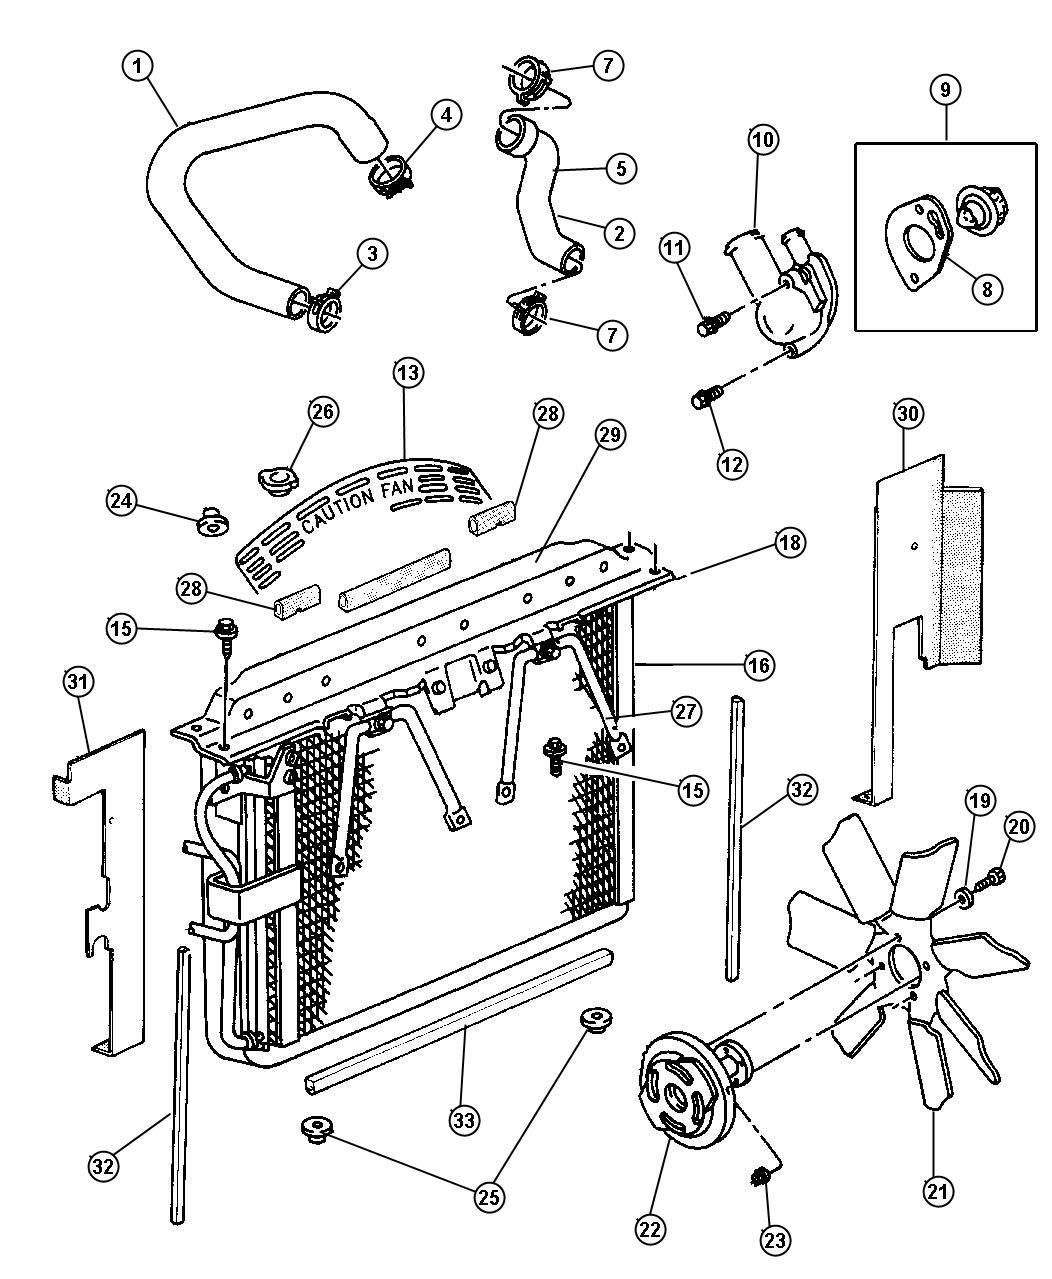 Dodge Ram Shroud Fan Engine Related Radiator